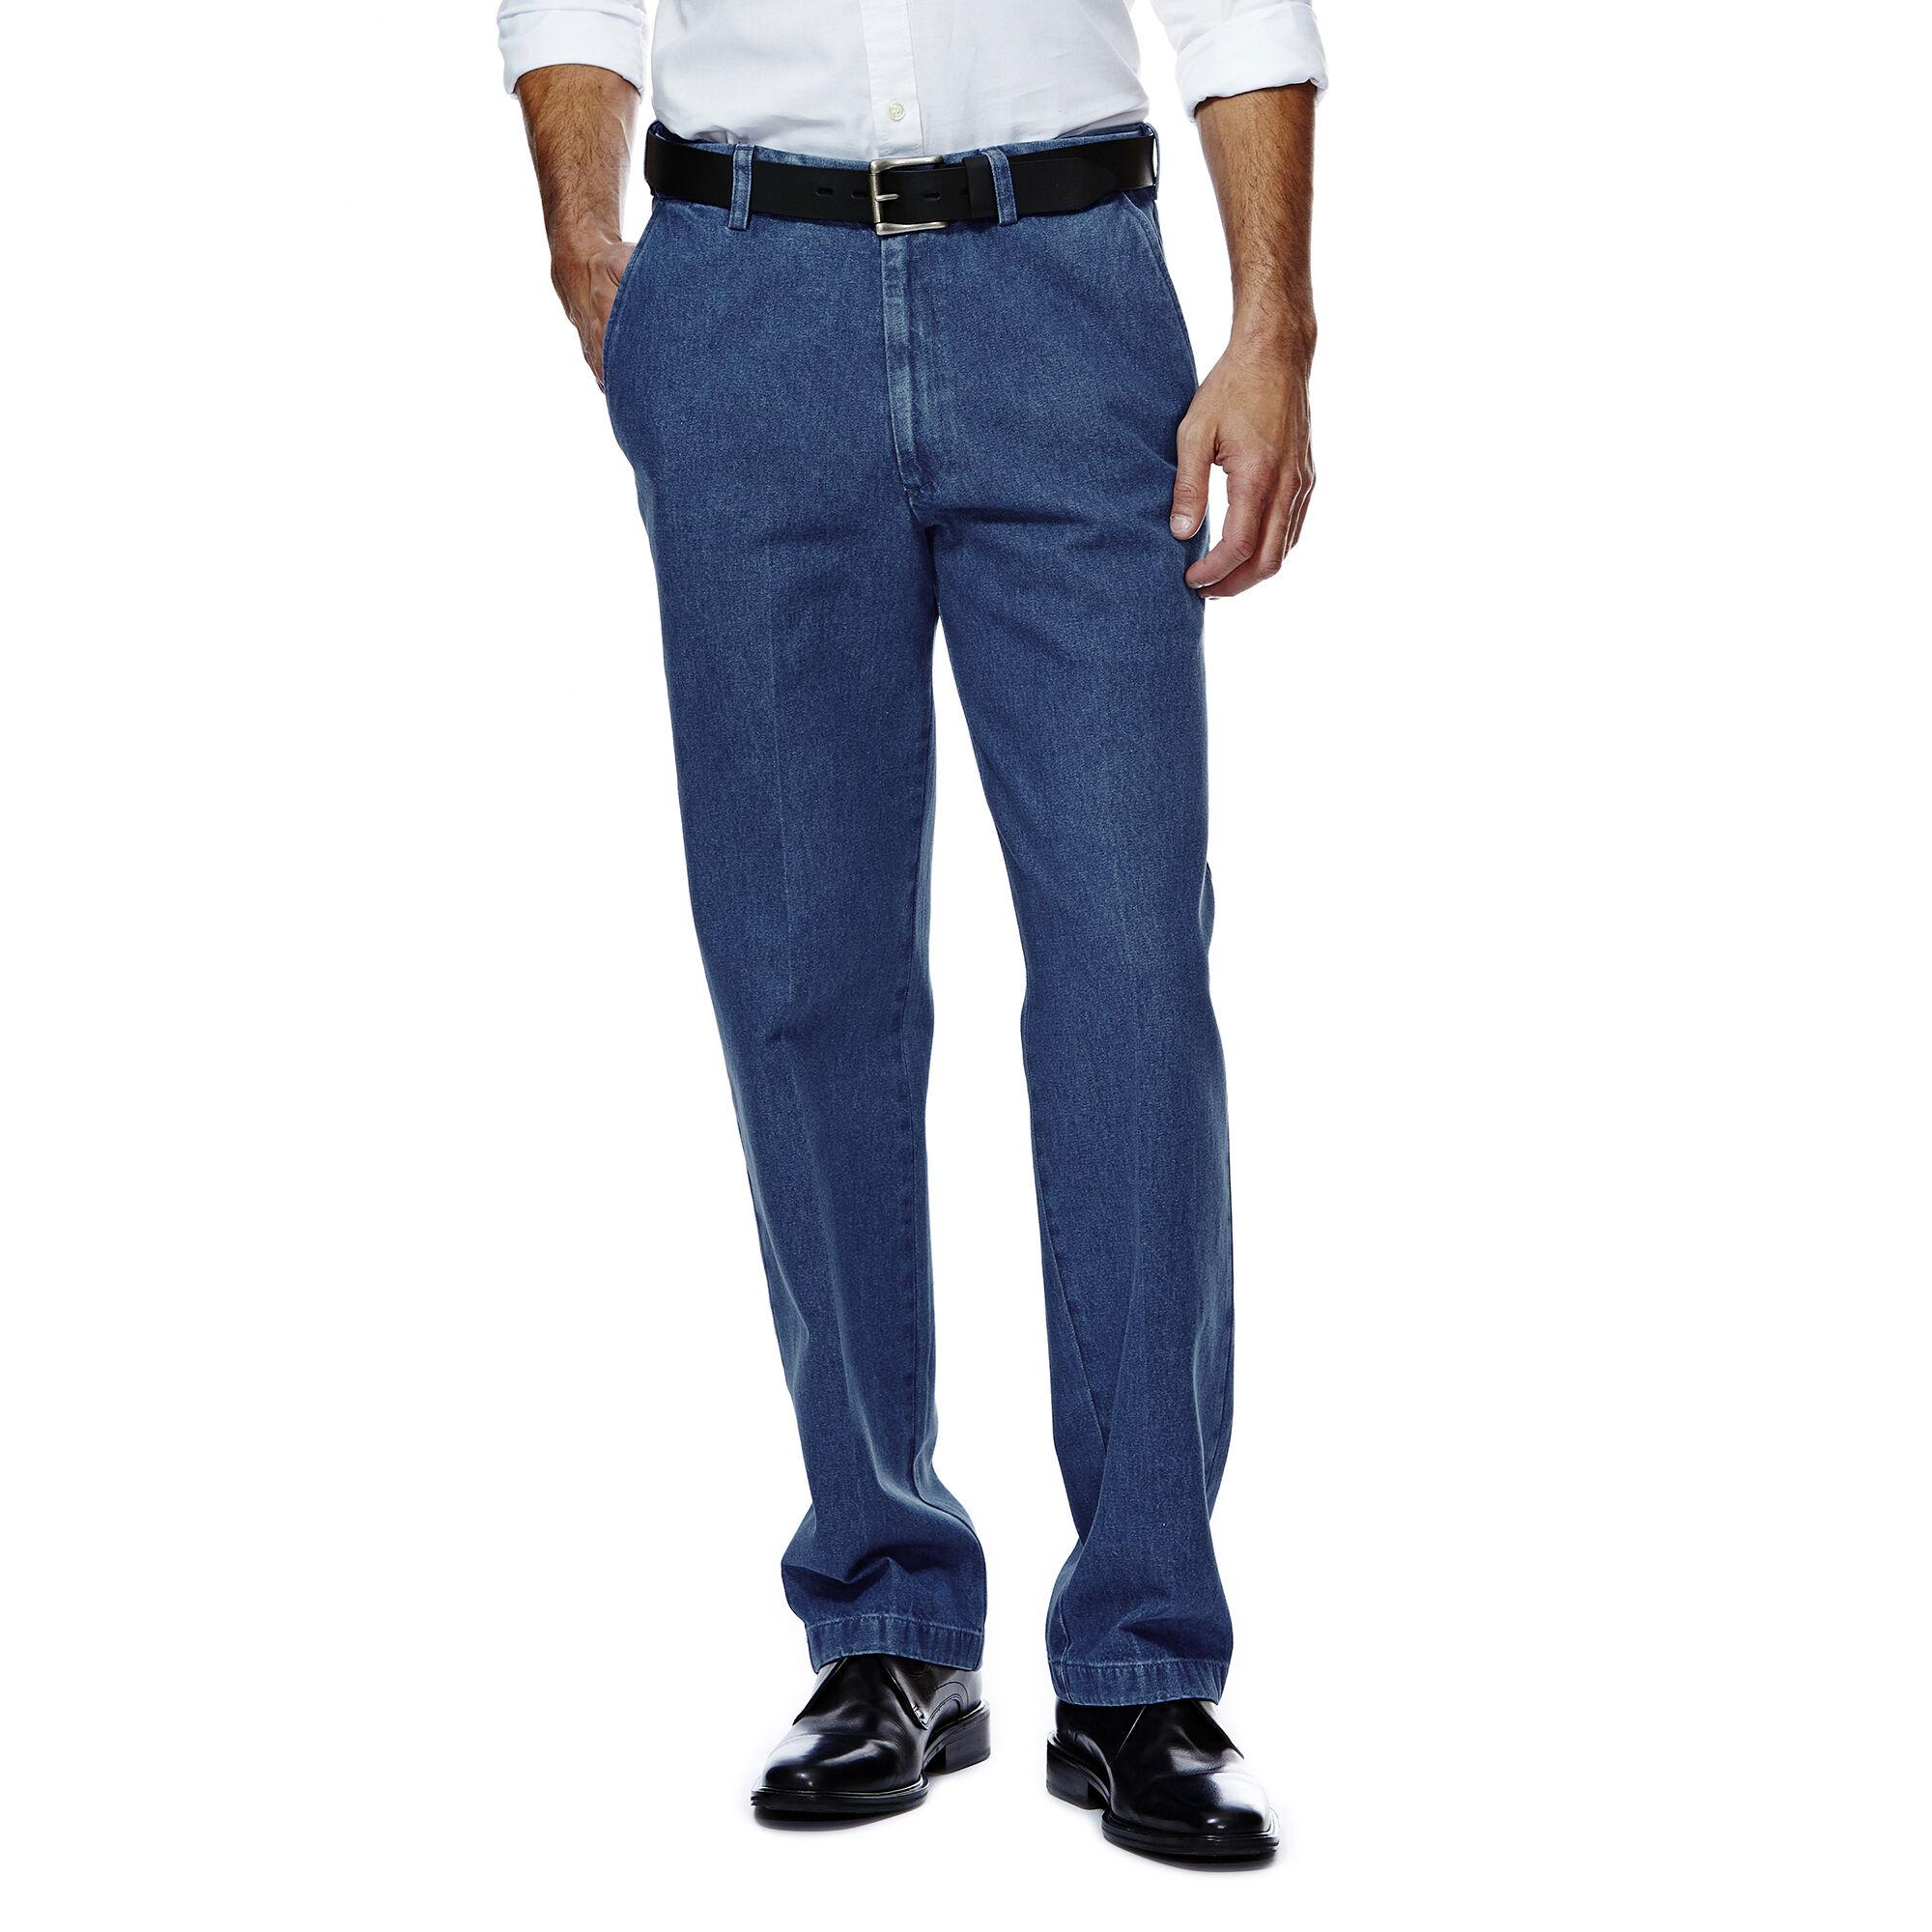 Haggar Men/'s Stretch Denim Expandable Waist Classic Fit Flat Front Pant